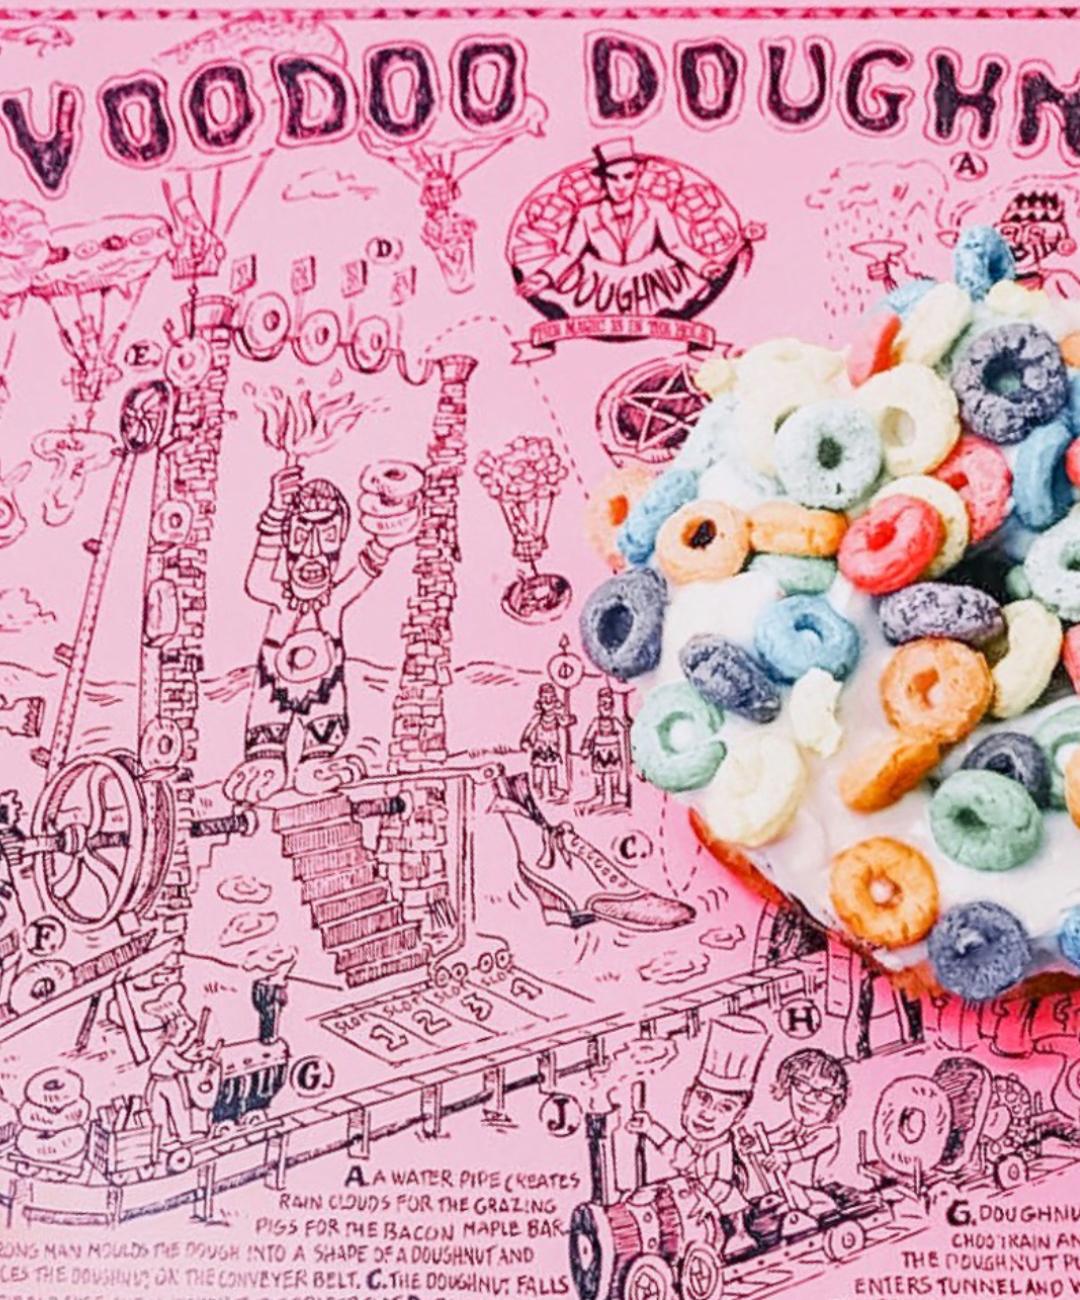 lauren_nicolle-austin-where-to-eat-voodoo-doughnuts